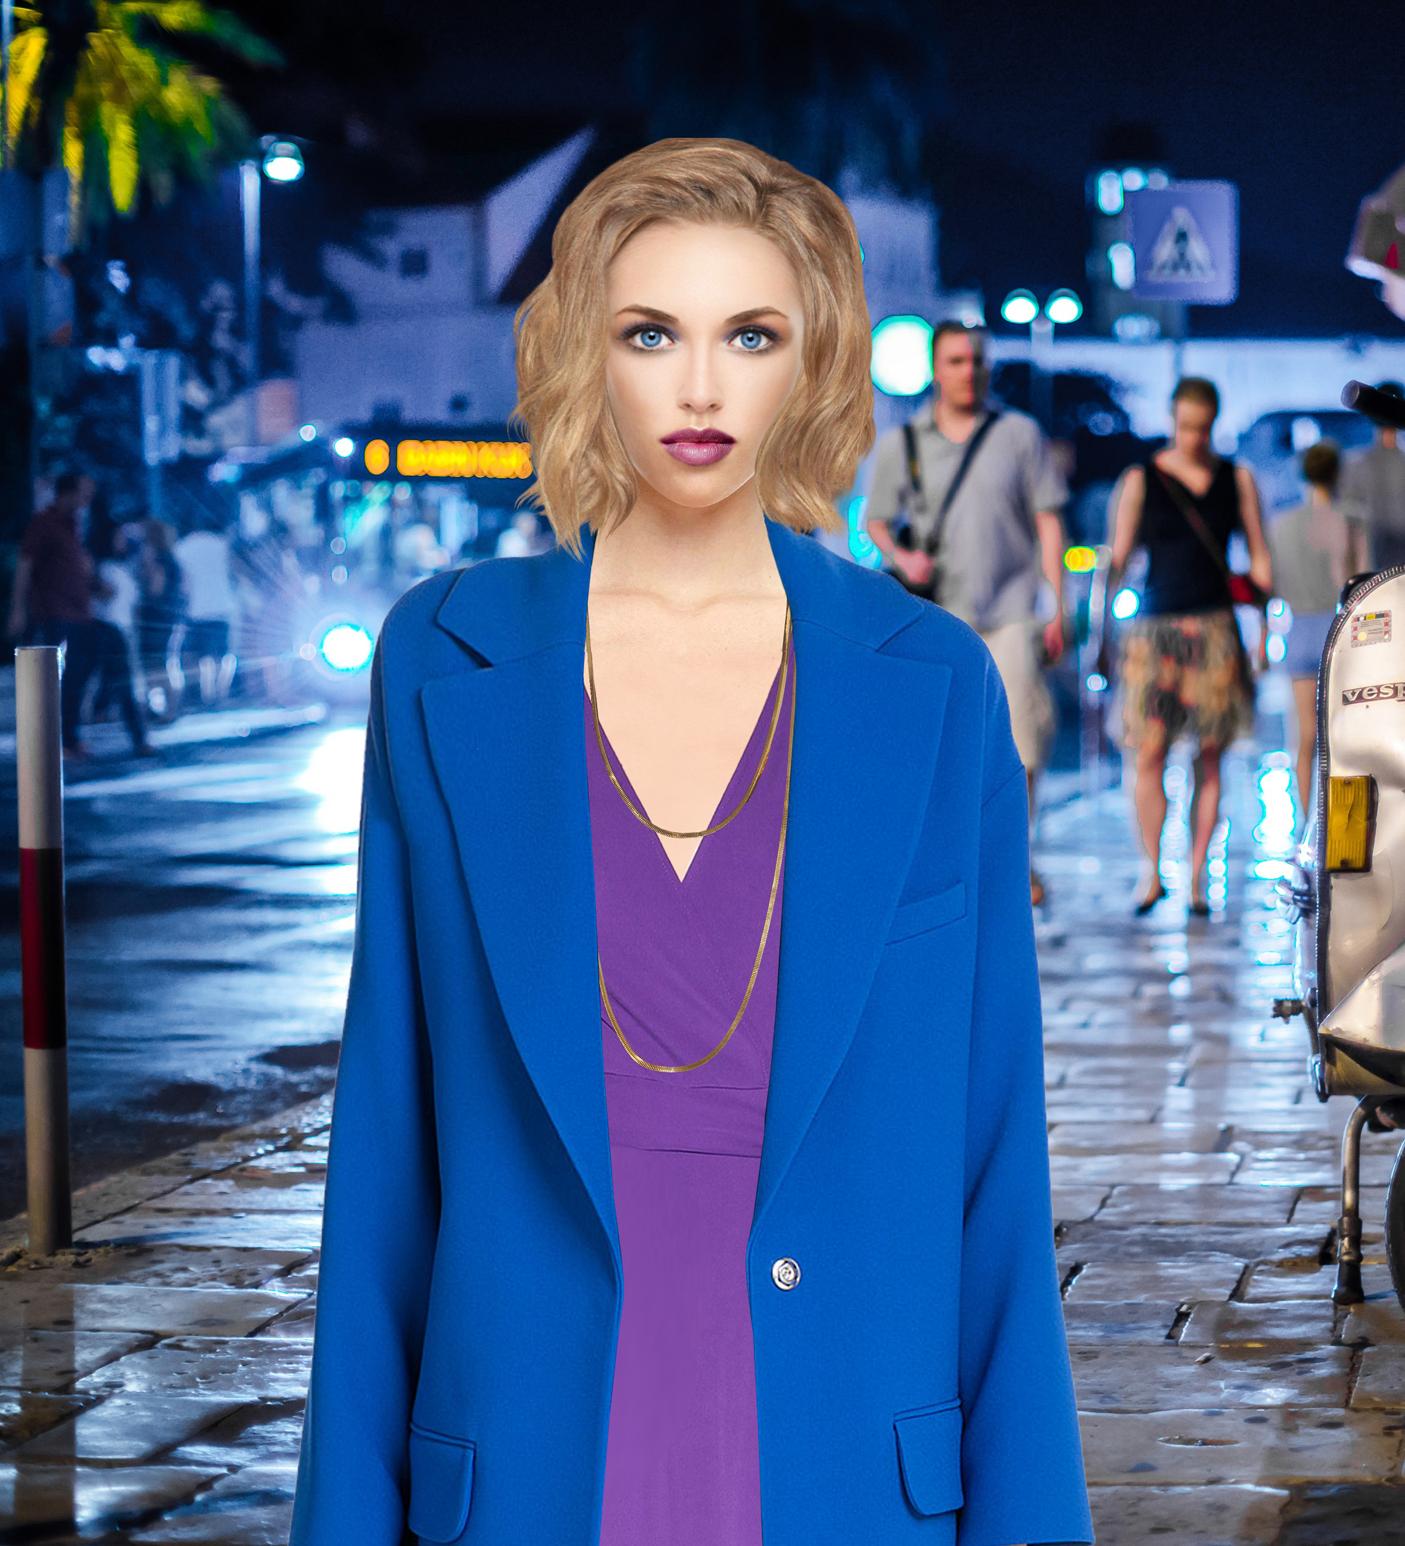 clothing model blue coat purple dress copy 2